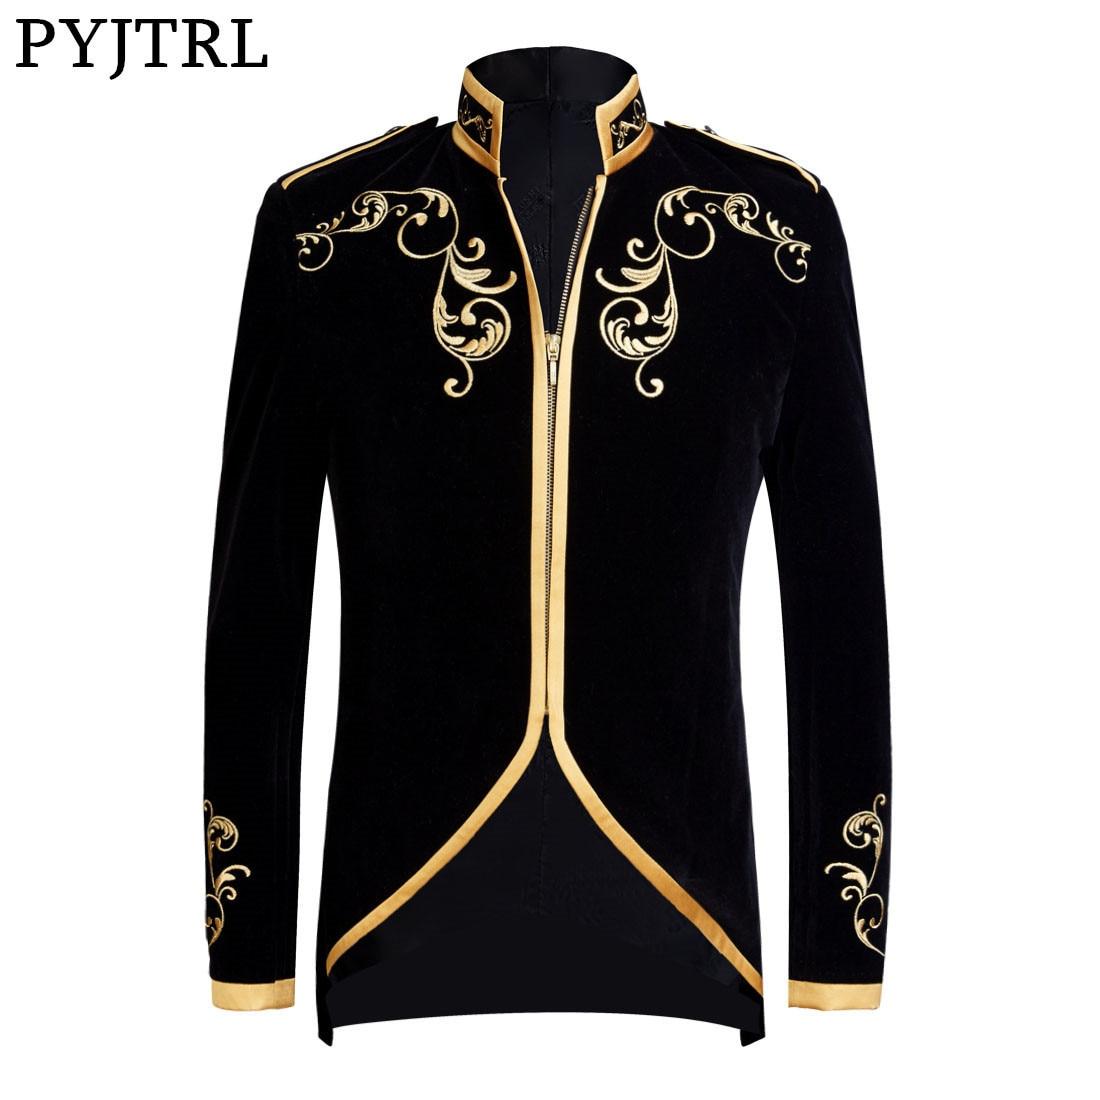 PYJTRL 英国スタイル宮殿王子ファッション黒ベルベットゴールド刺繍ブレザー結婚式新郎スリムフィットスーツジャケット歌手コート